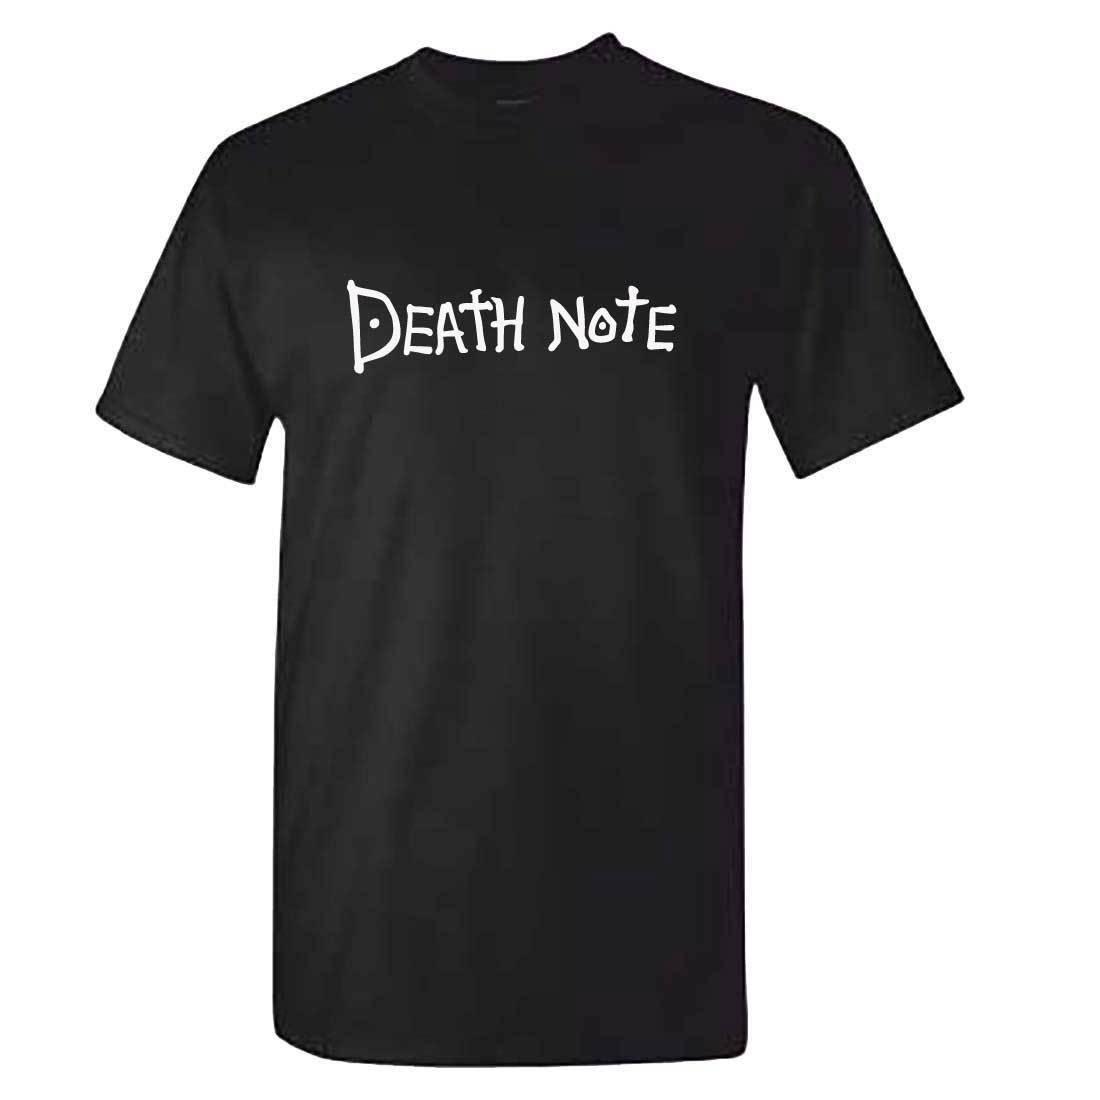 Tops Wholesale Tee Grade Products According To Quality Tsugumi Ohba Anime Manga Comic Deathnote T Shirt Shinigami 100% Cotton Tee Shirt Death Note Tshirt